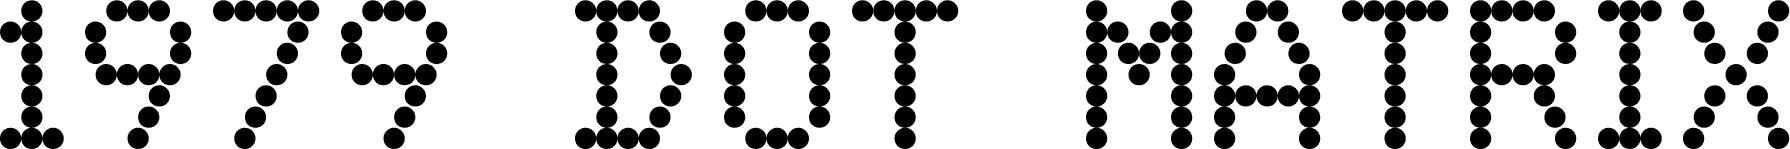 1979 Dot Matrix Regular font